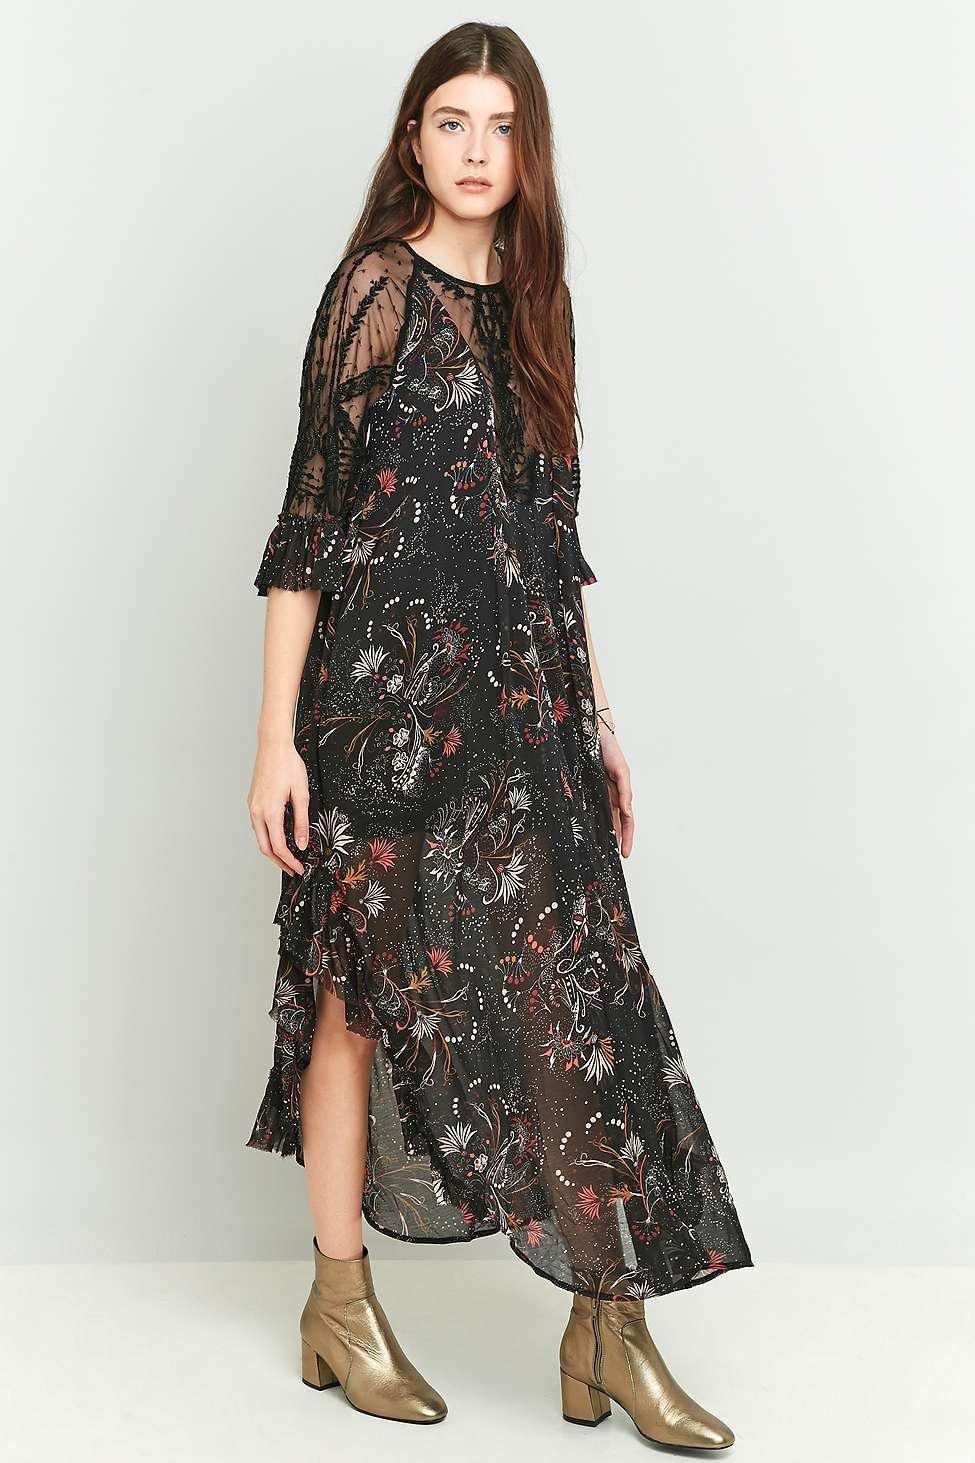 Free People Lace Spirit Of The Wild Black Maxi Dress